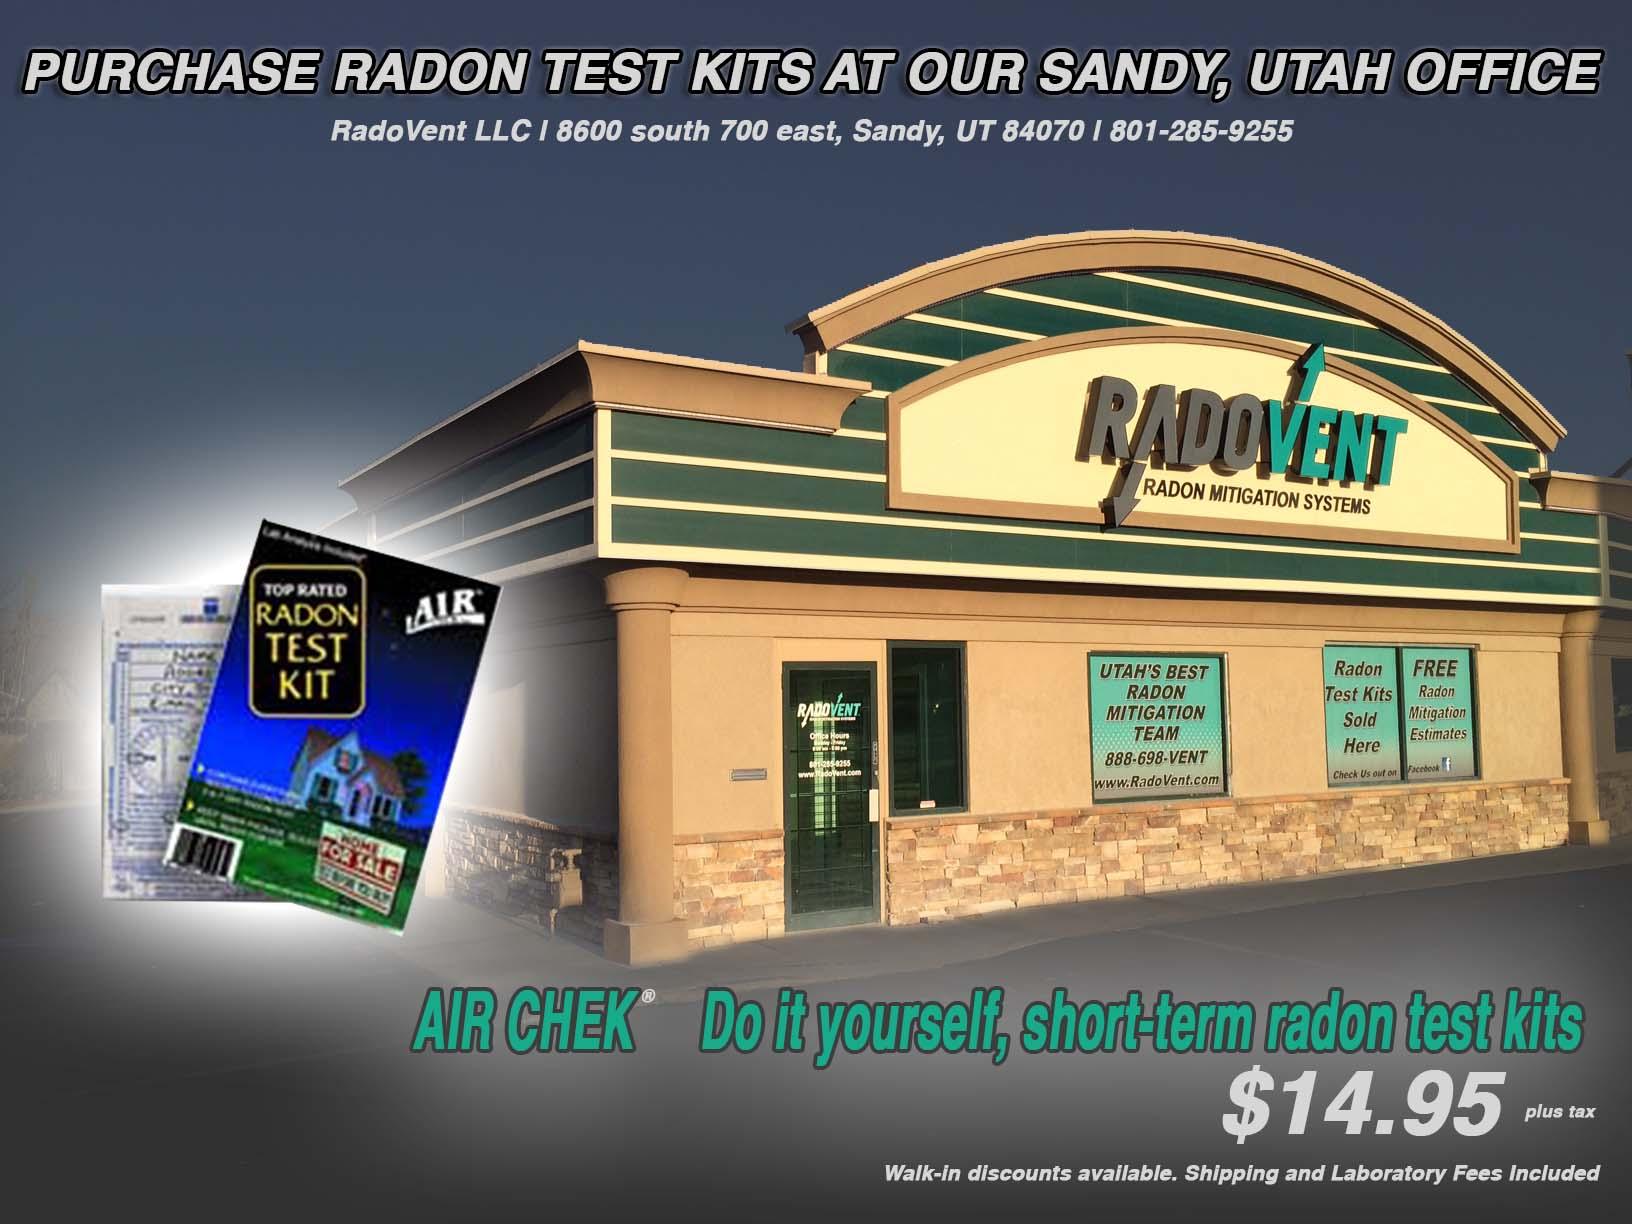 Radovent_radon_test_kits_sold_here